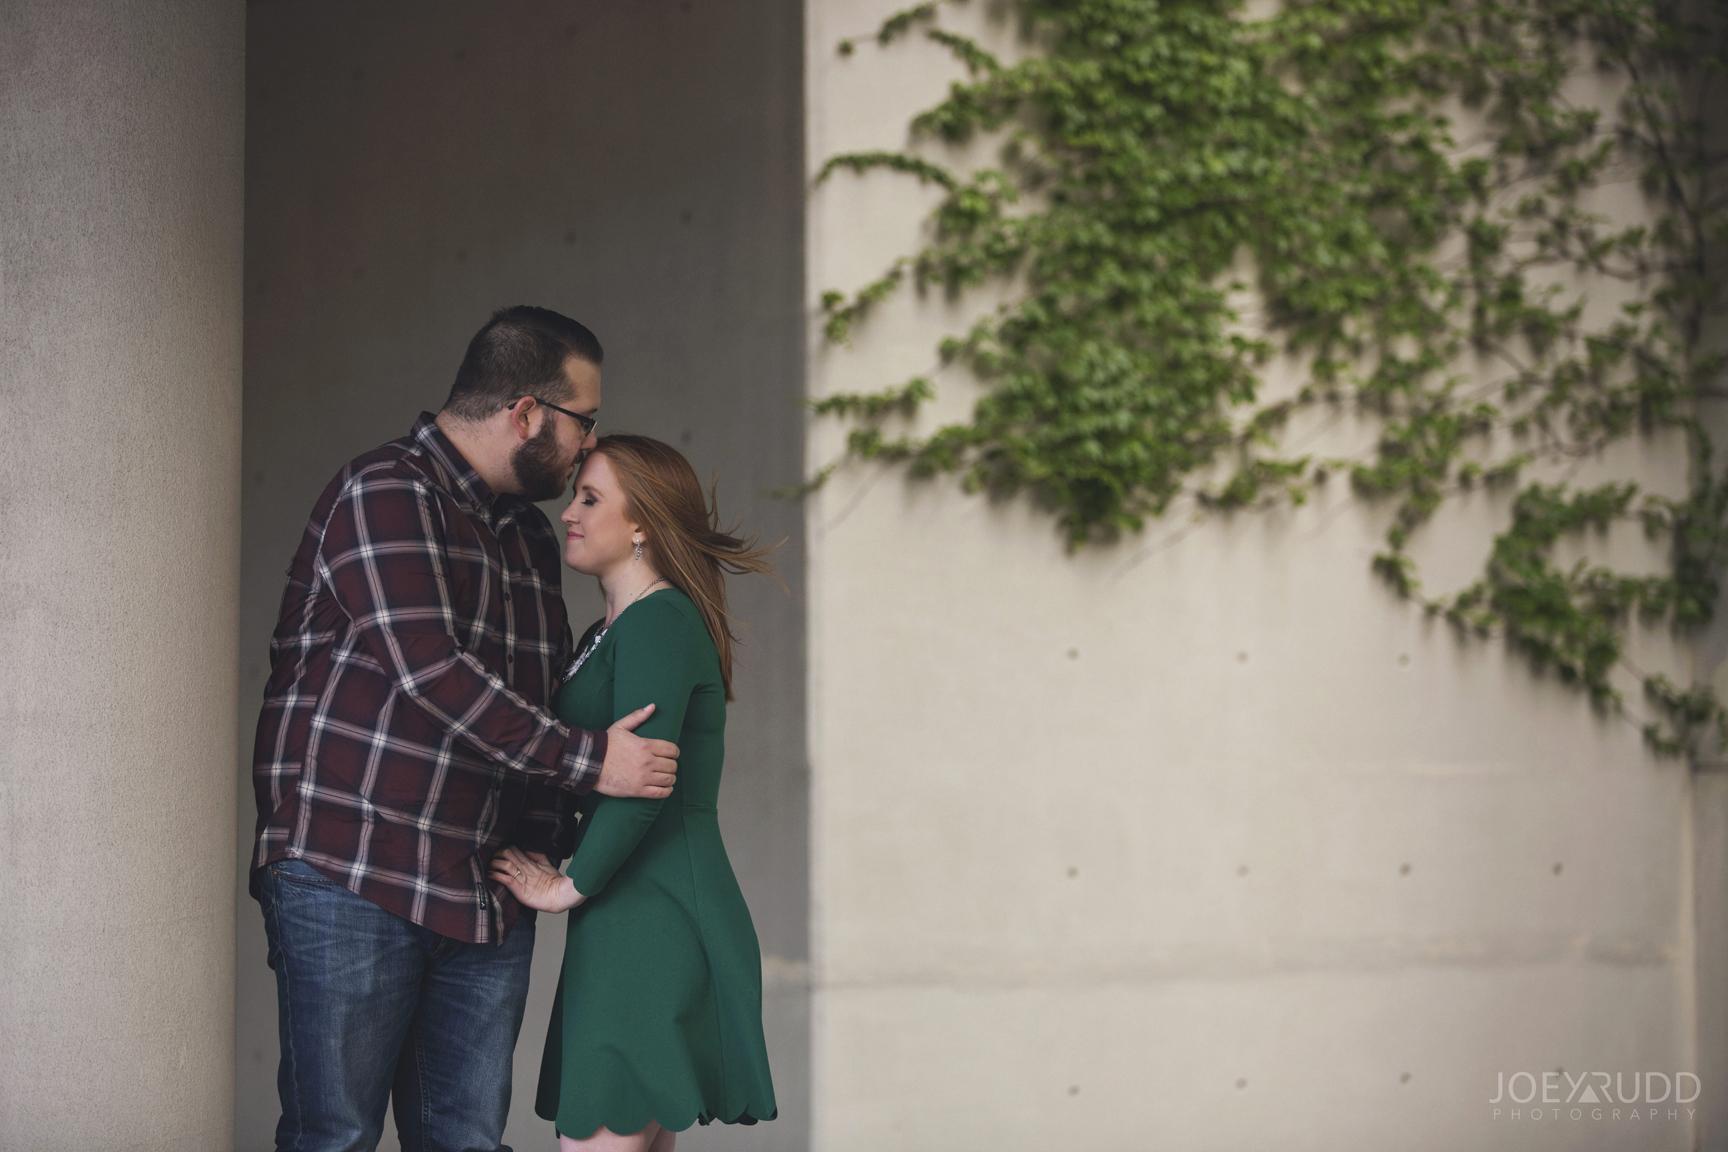 University of Ottawa Engagement by Ottawa Wedding Photographer Joey Rudd Photography Interesting Pose